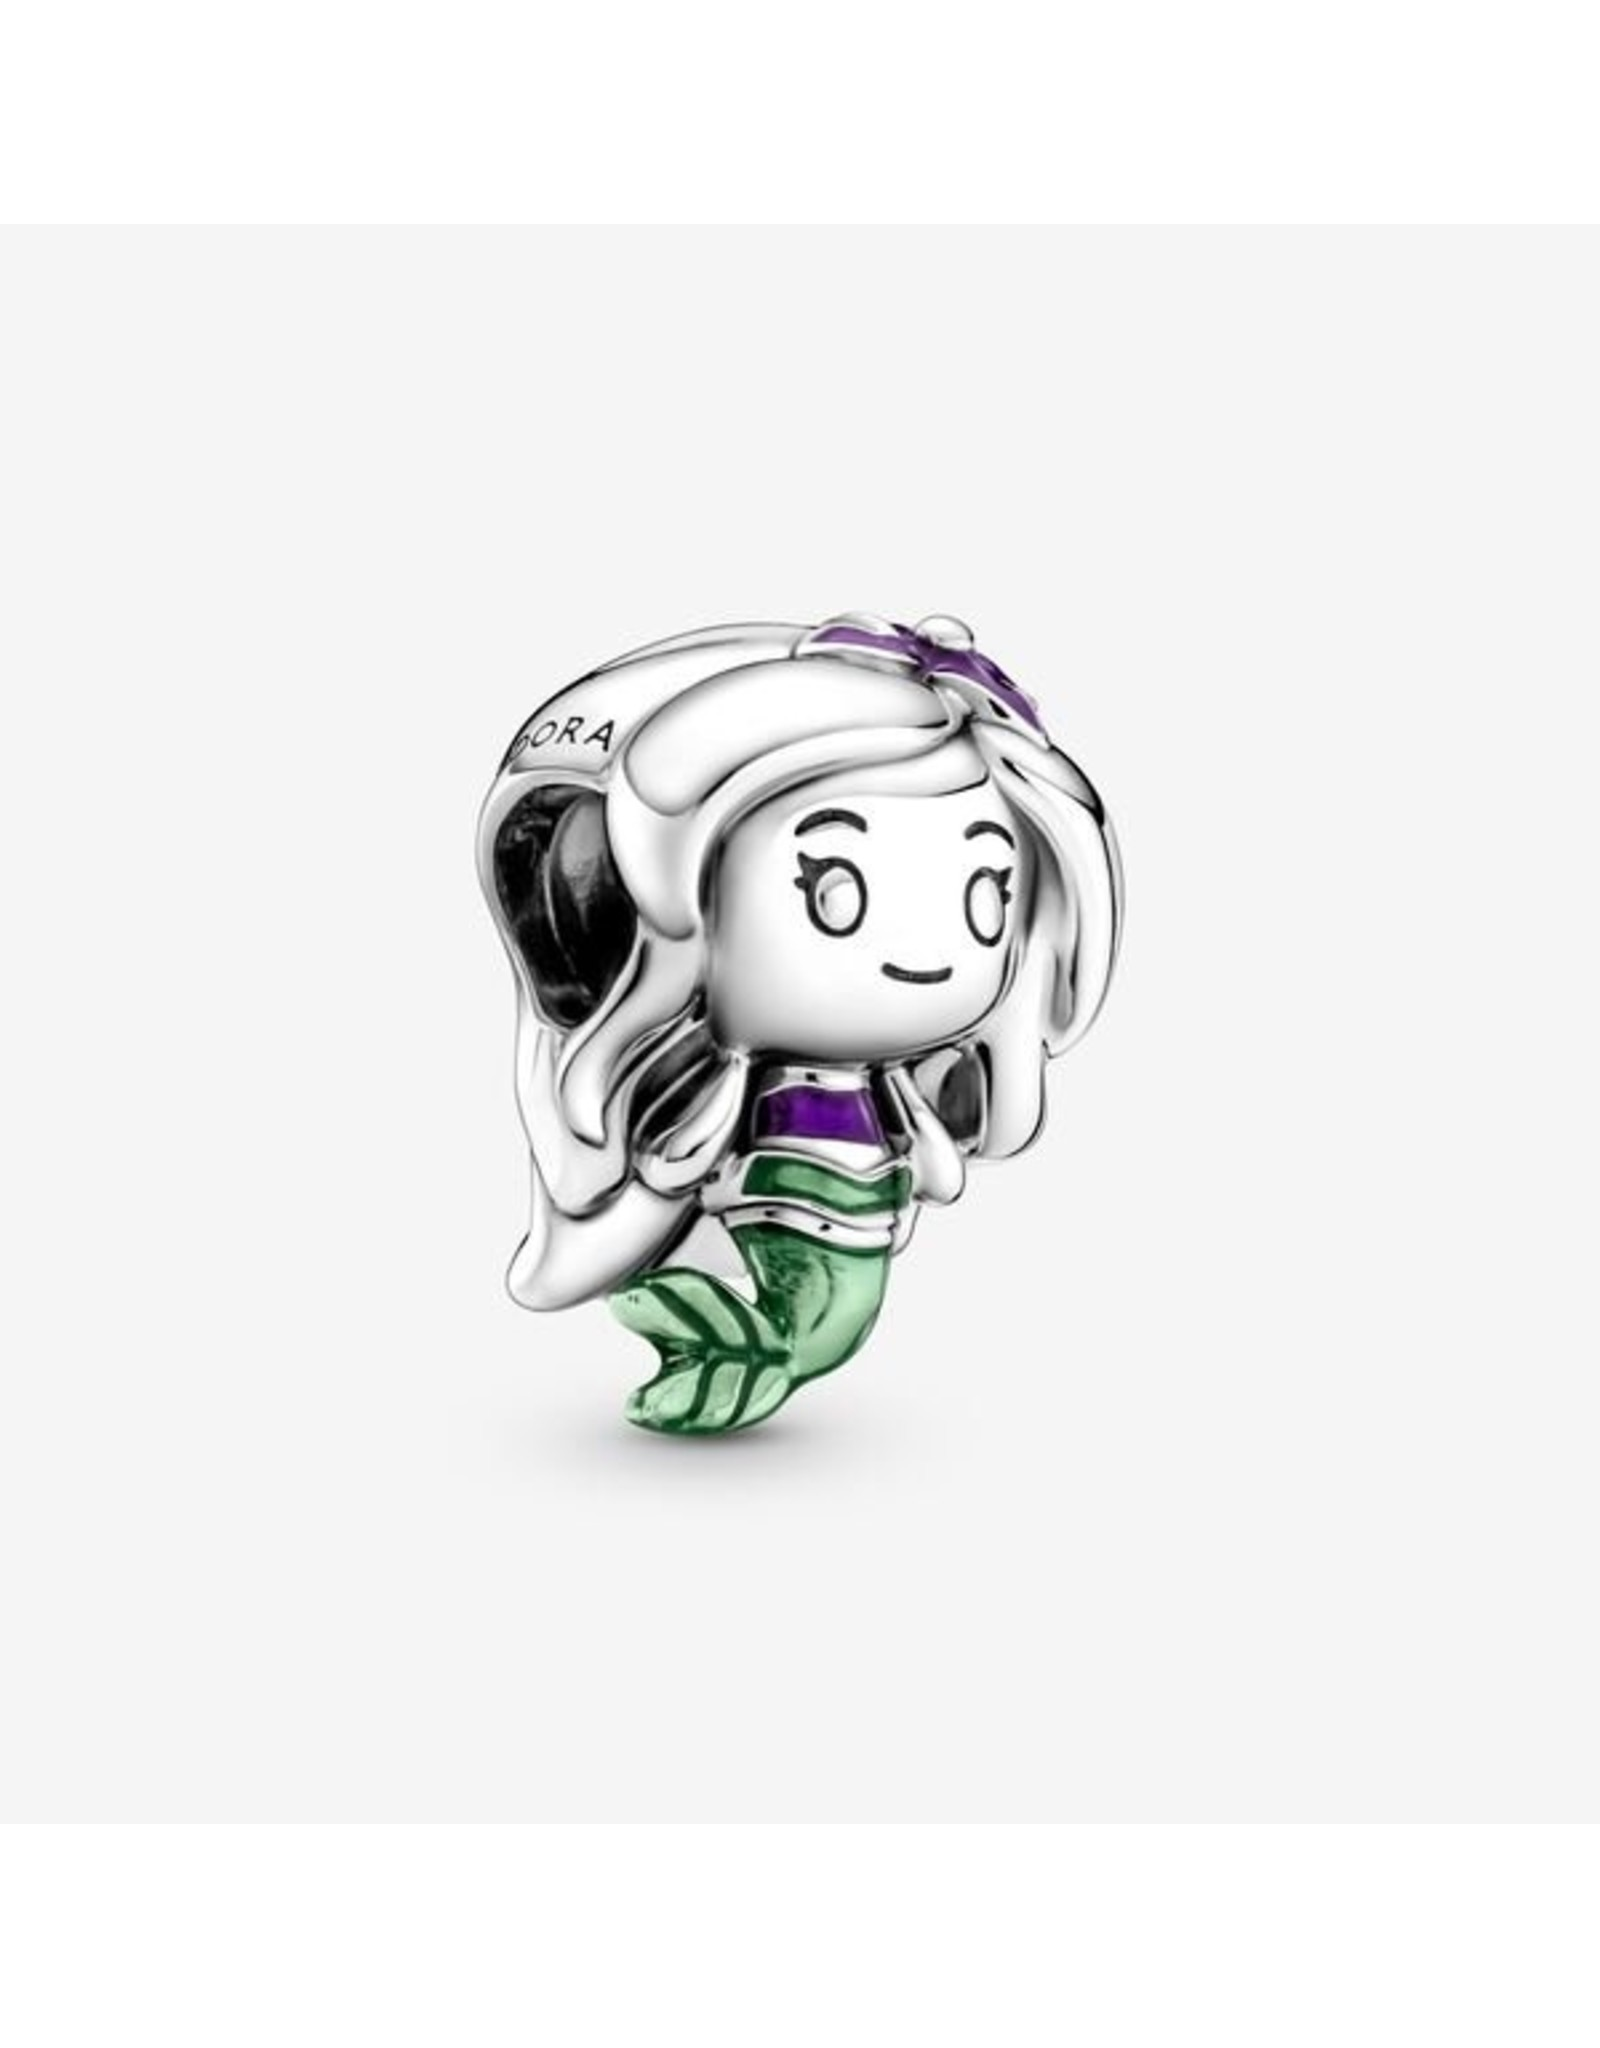 Pandora Pandora Charm, 799508C01 Disney The Little Mermaid Ariel, Purple & Green Enamel